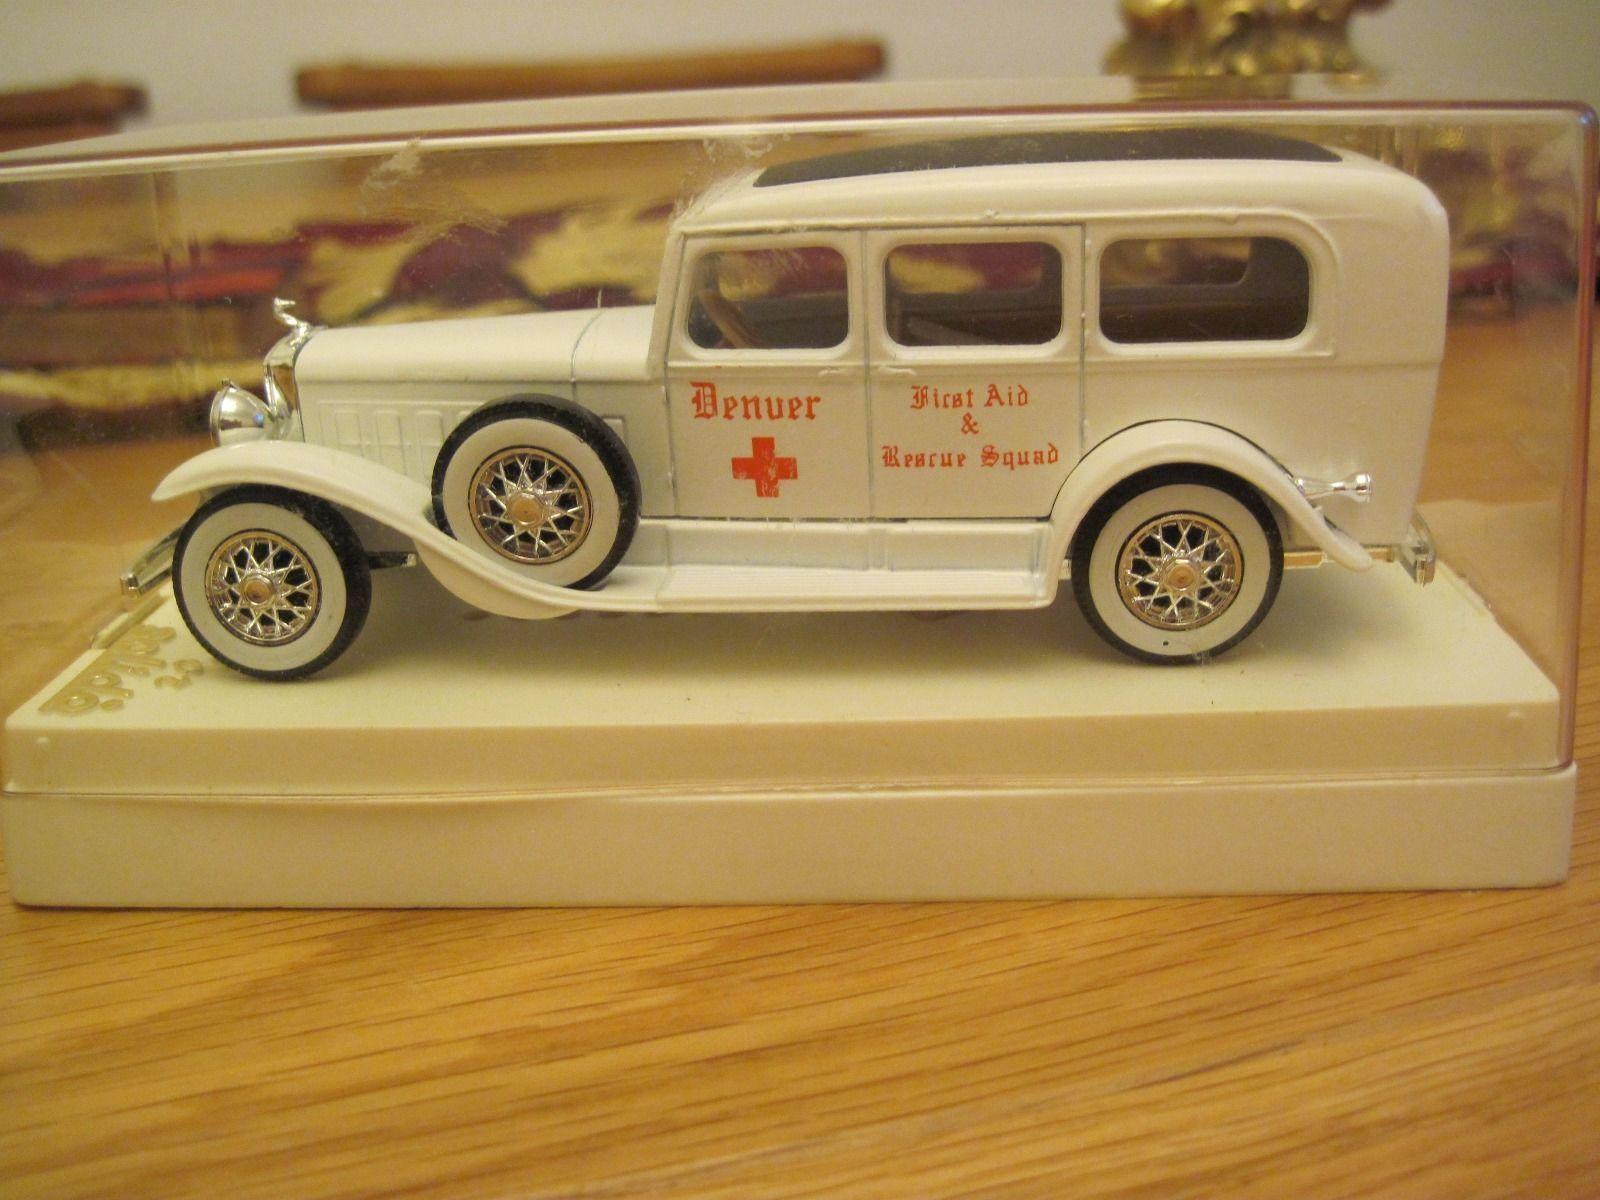 SOLIDO CADILLAC AMBULANCE 1:43 scale   Ambulance, Cadillac and Scale